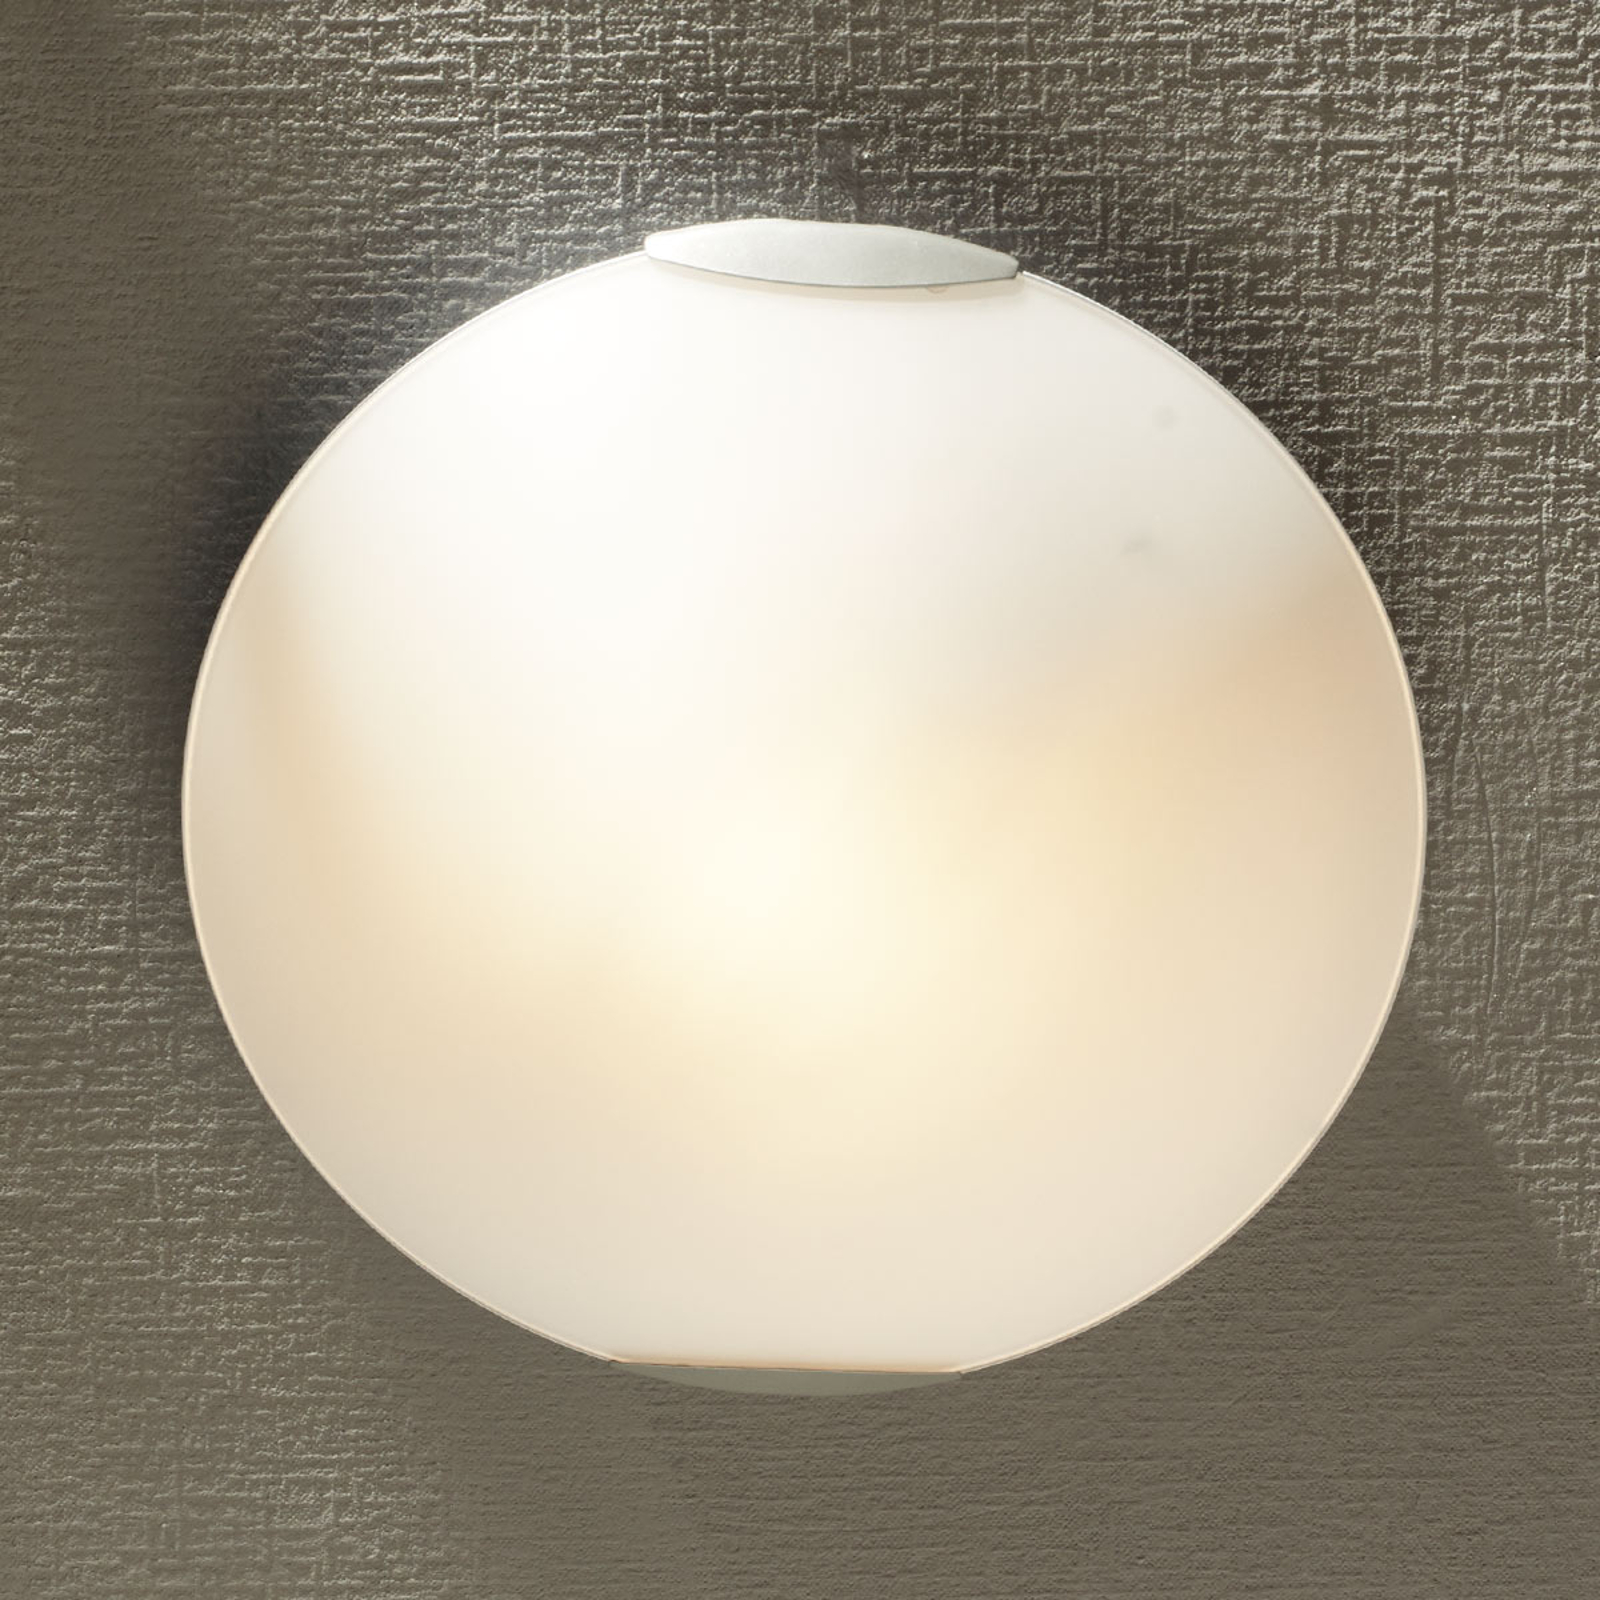 Tijdloze plafondlamp FOX, 30 cm